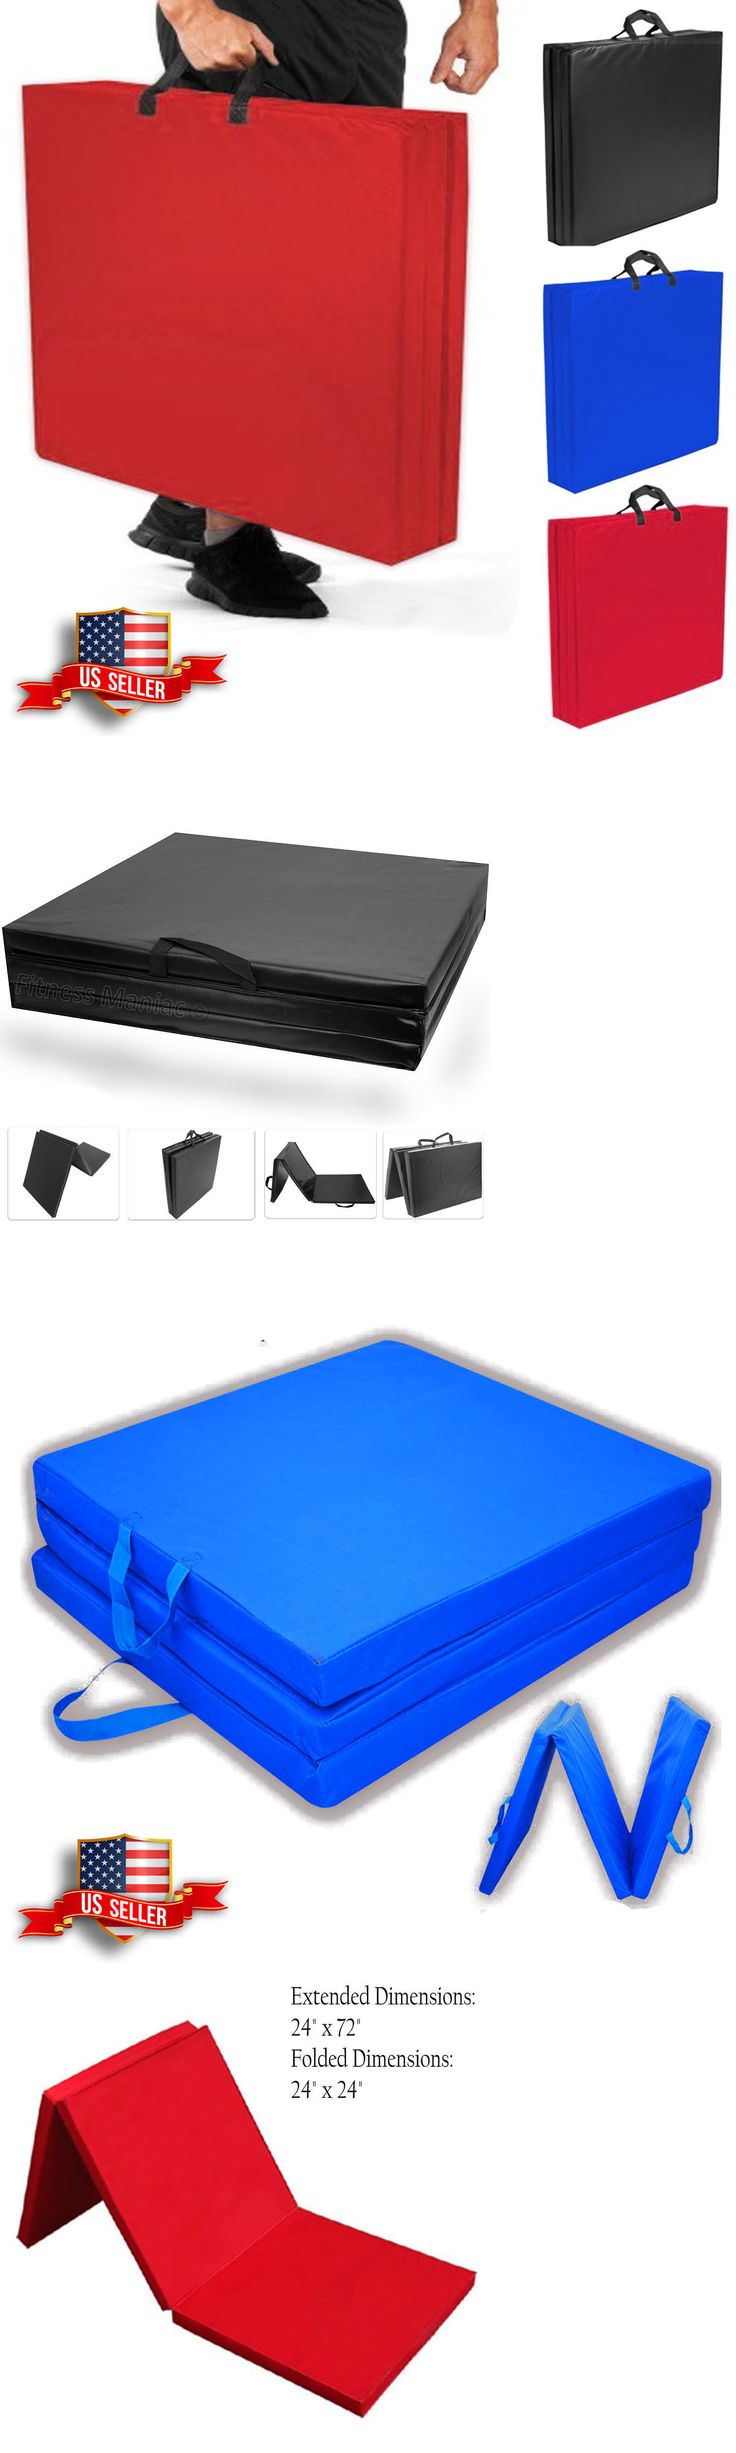 Exercise Mats 44079: Folding Gymnastic Gym Mat Panel Aerobics Exercise Tumbling Black Blue Red -> BUY IT NOW ONLY: $31.49 on eBay!